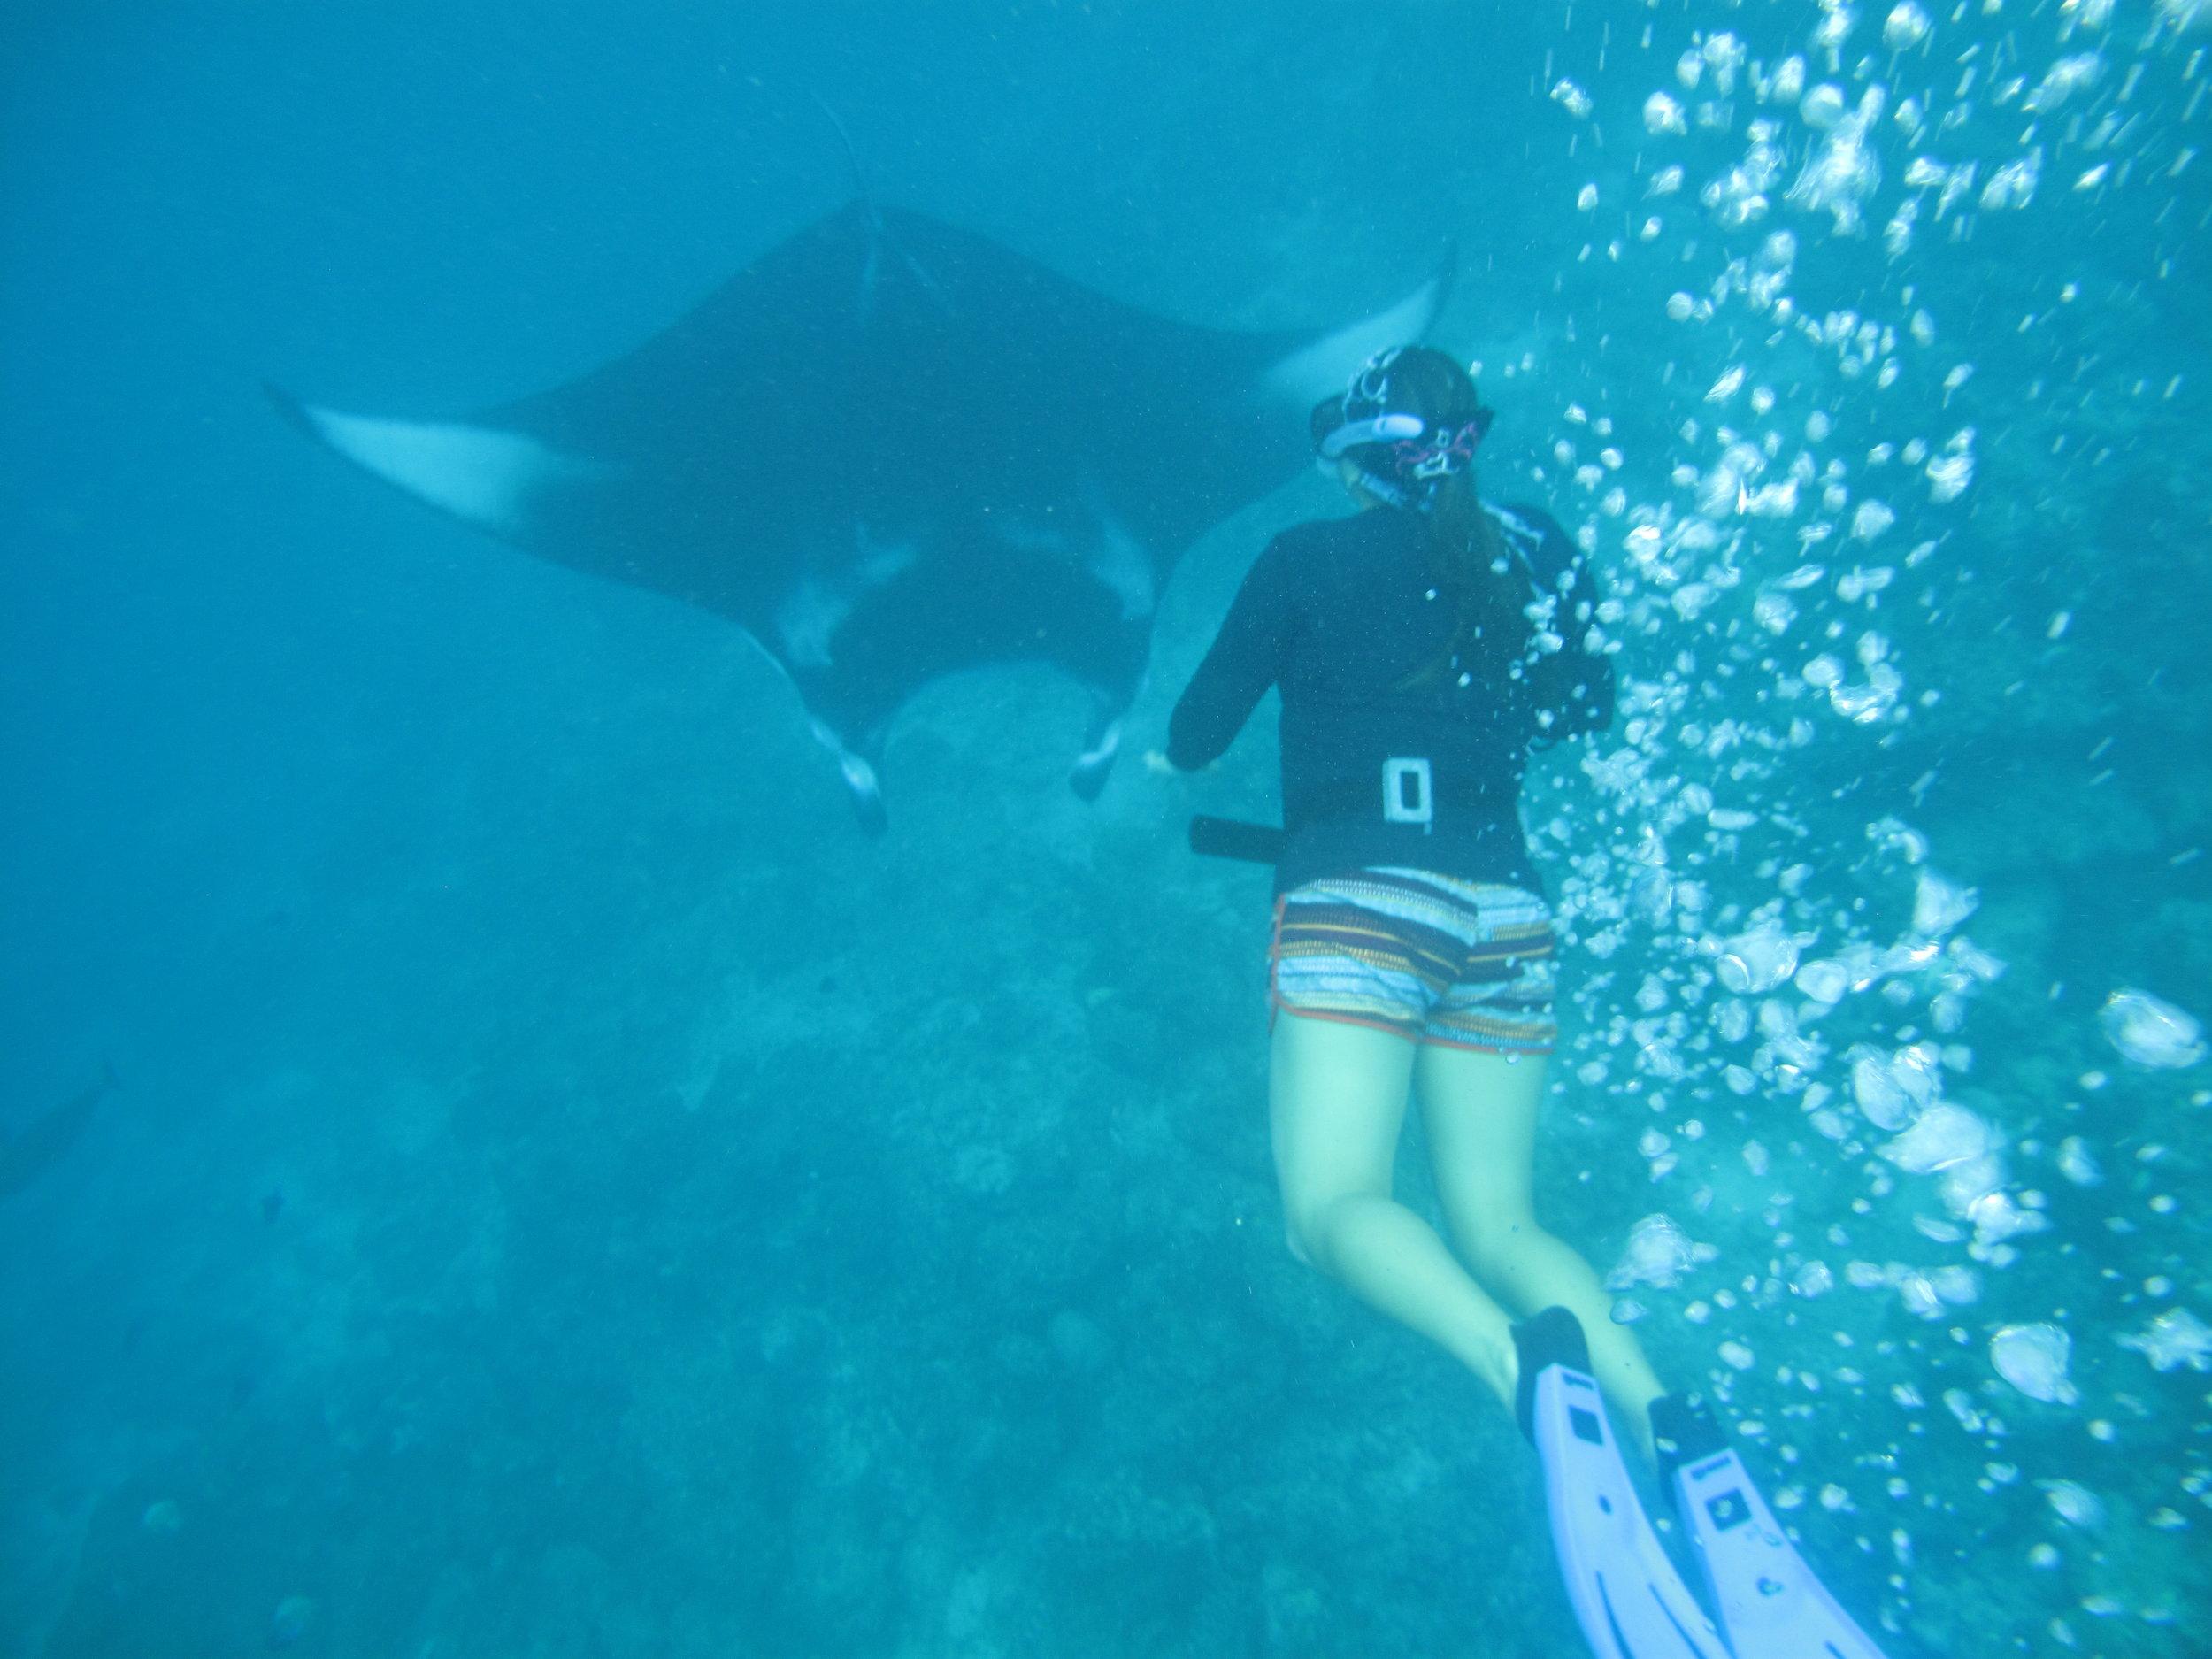 Stefany freediving down towards a reef manta ray, during an internship with the Maldivian Manta Ray Project.